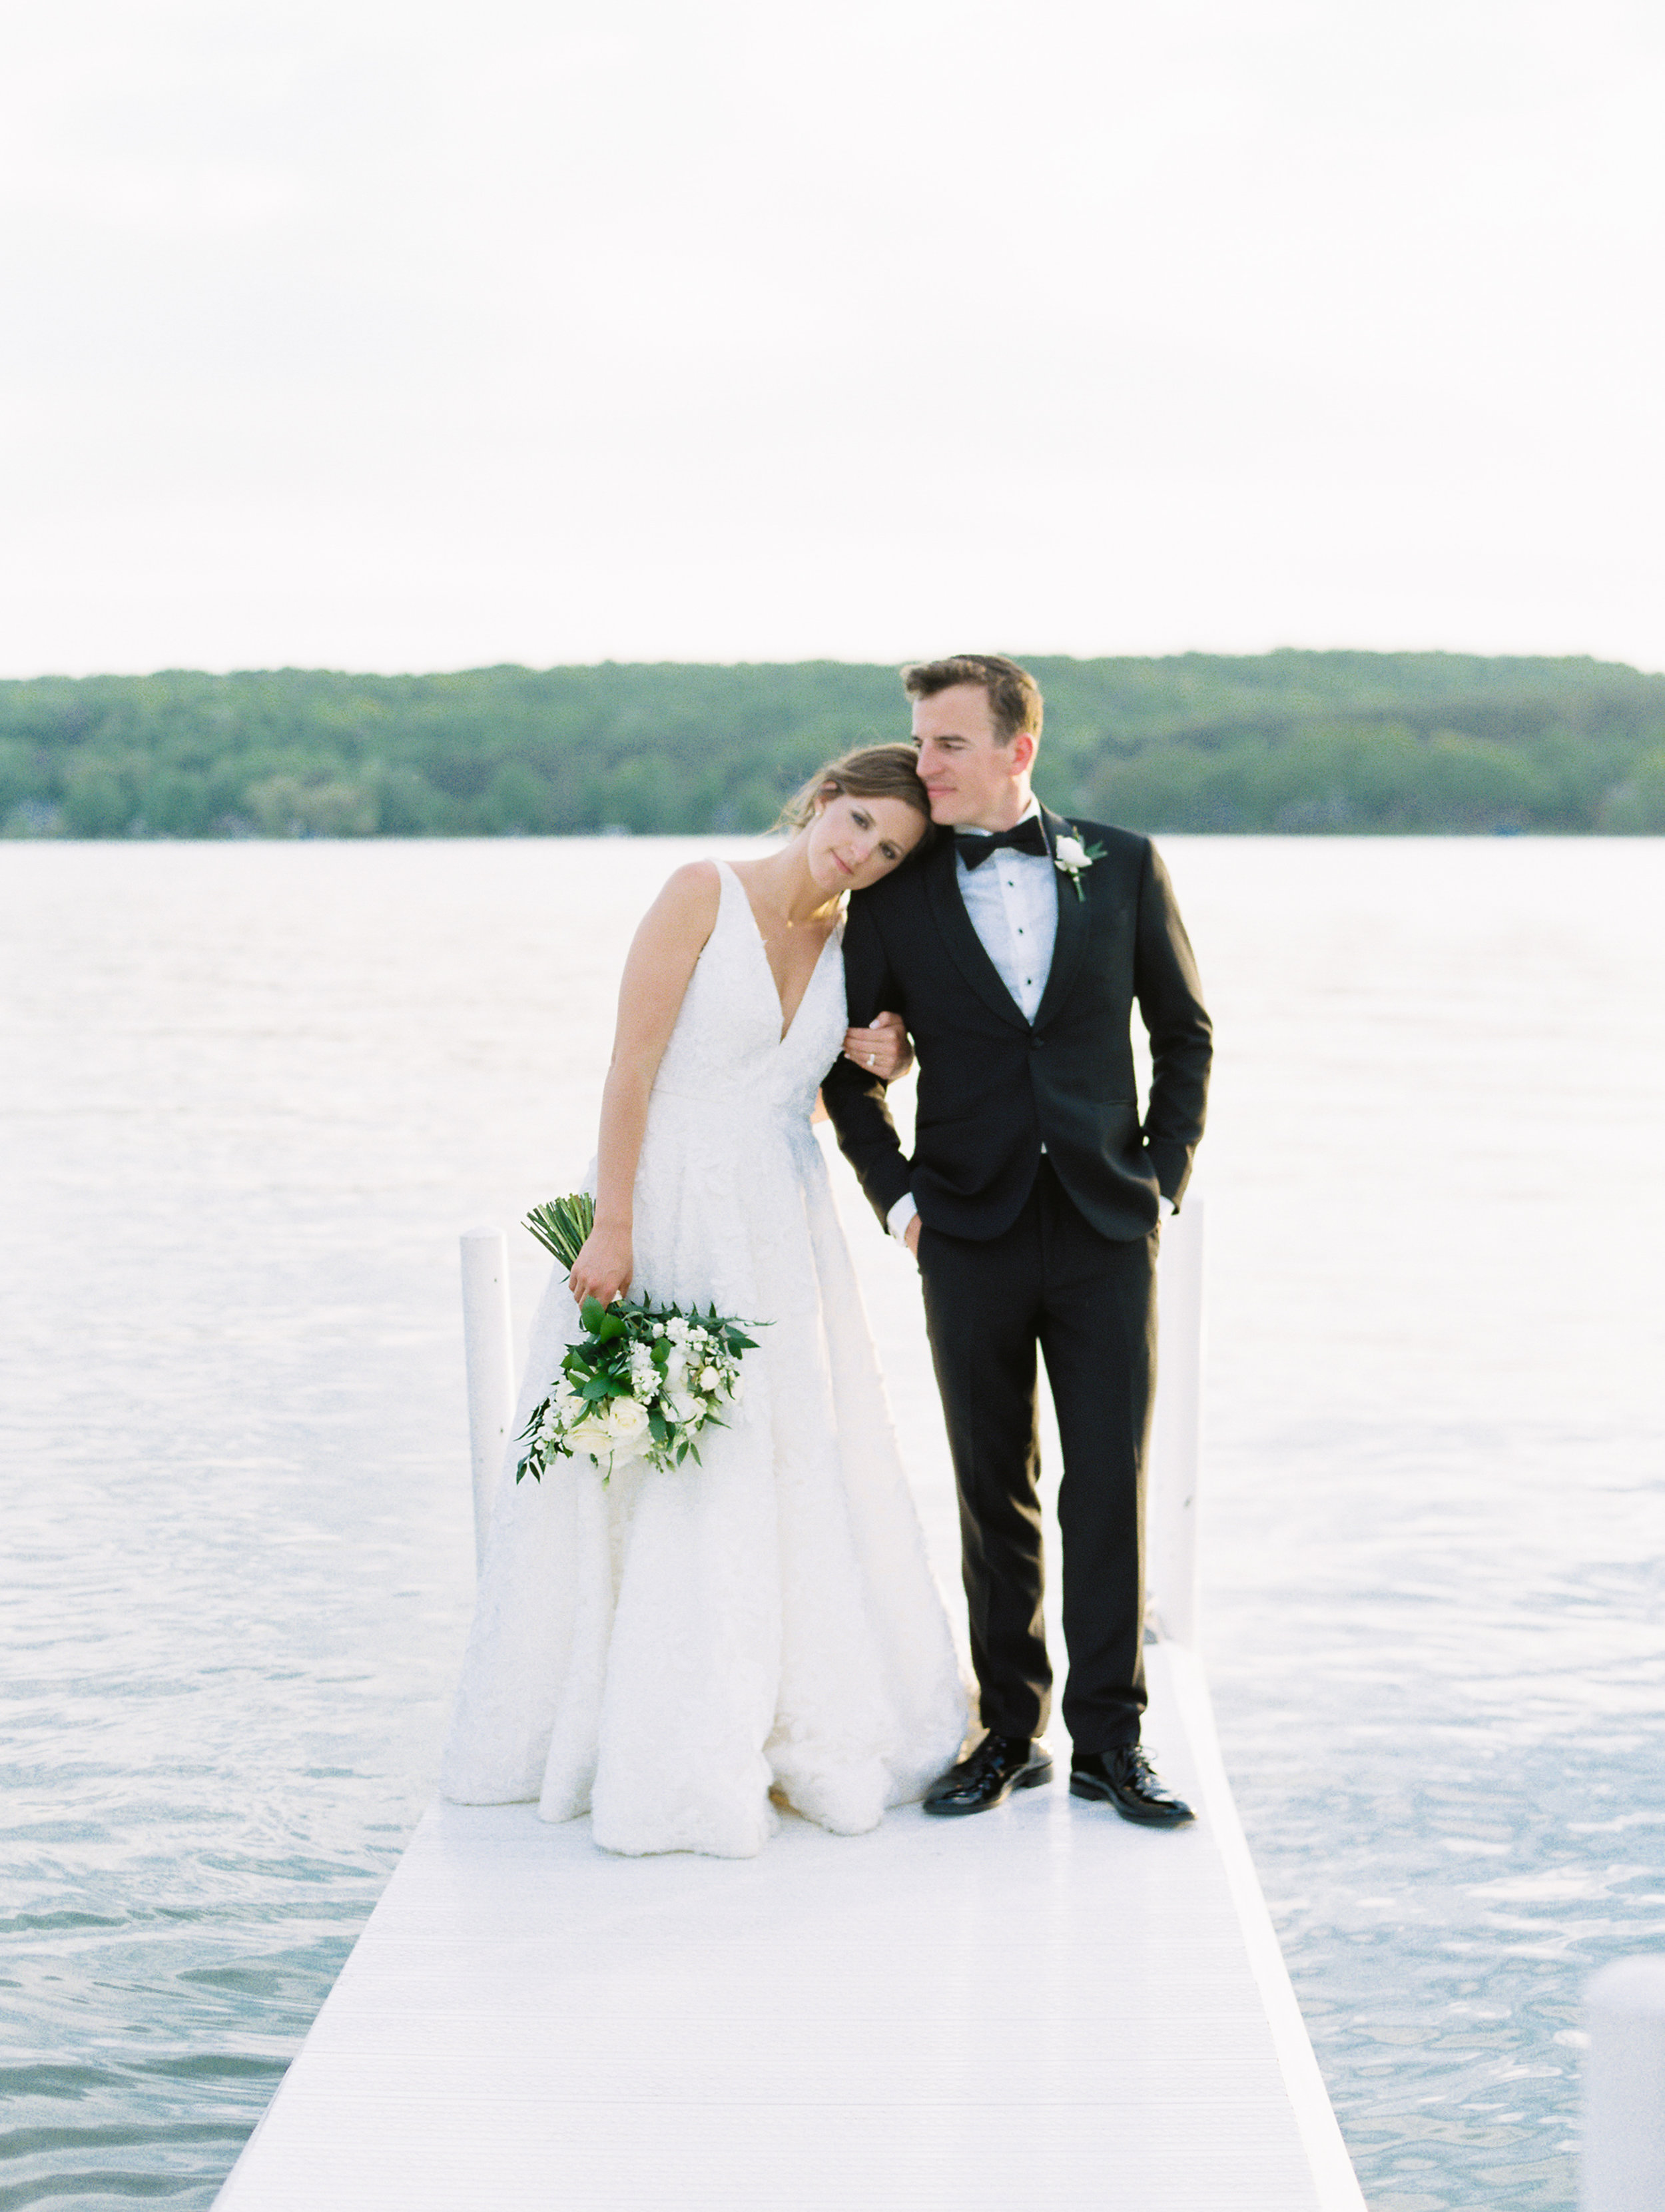 DeGuilio+Wedding+BrideGroomSunsetf-19.jpg